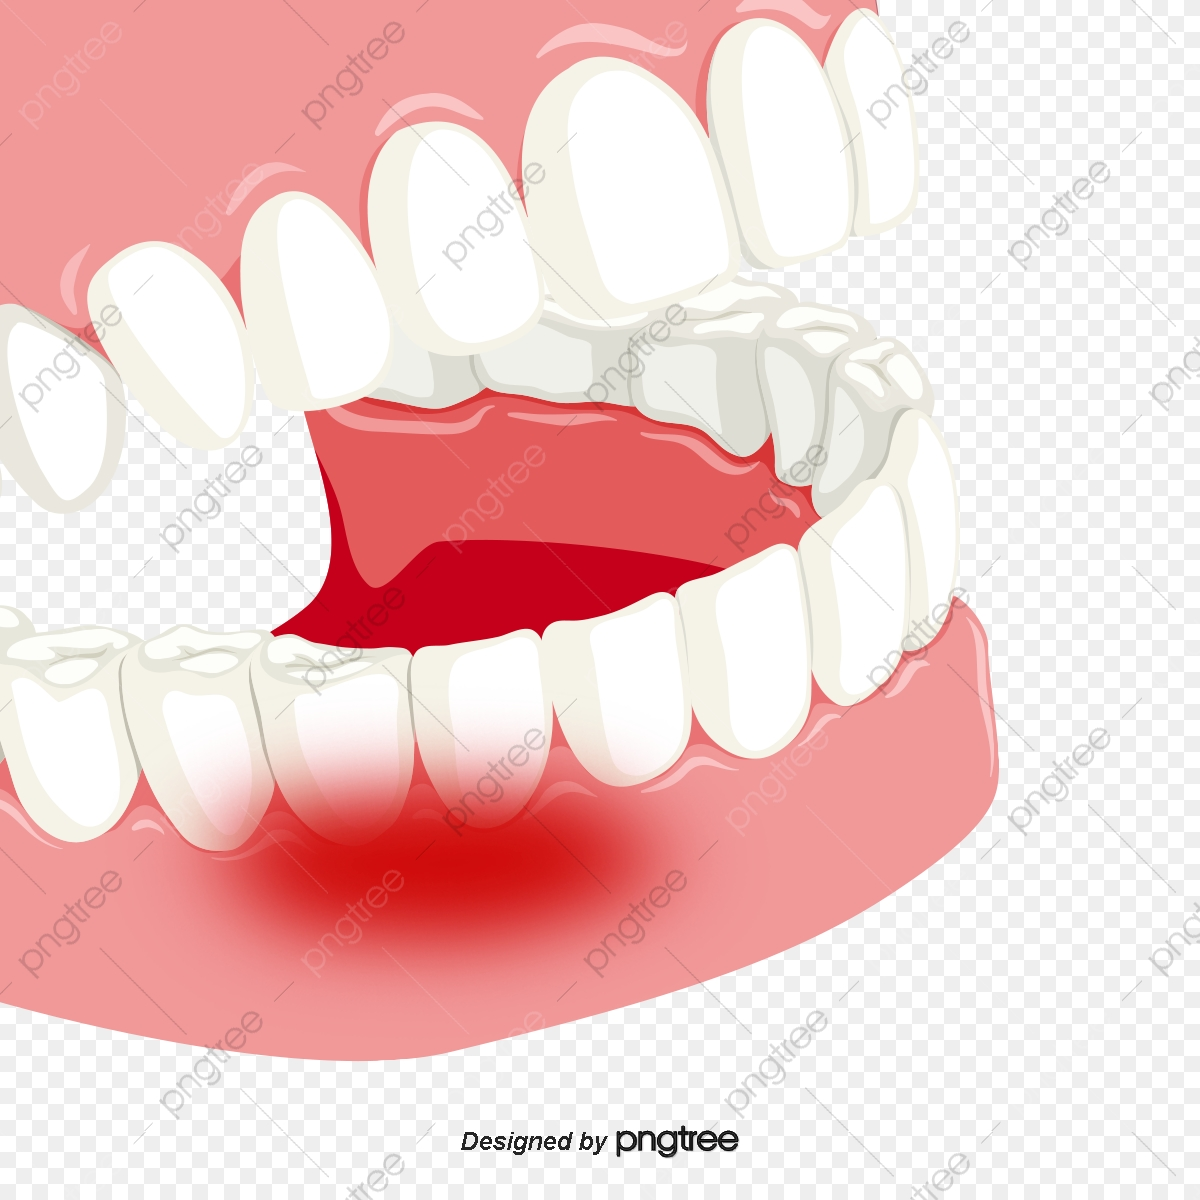 Dentist Map on